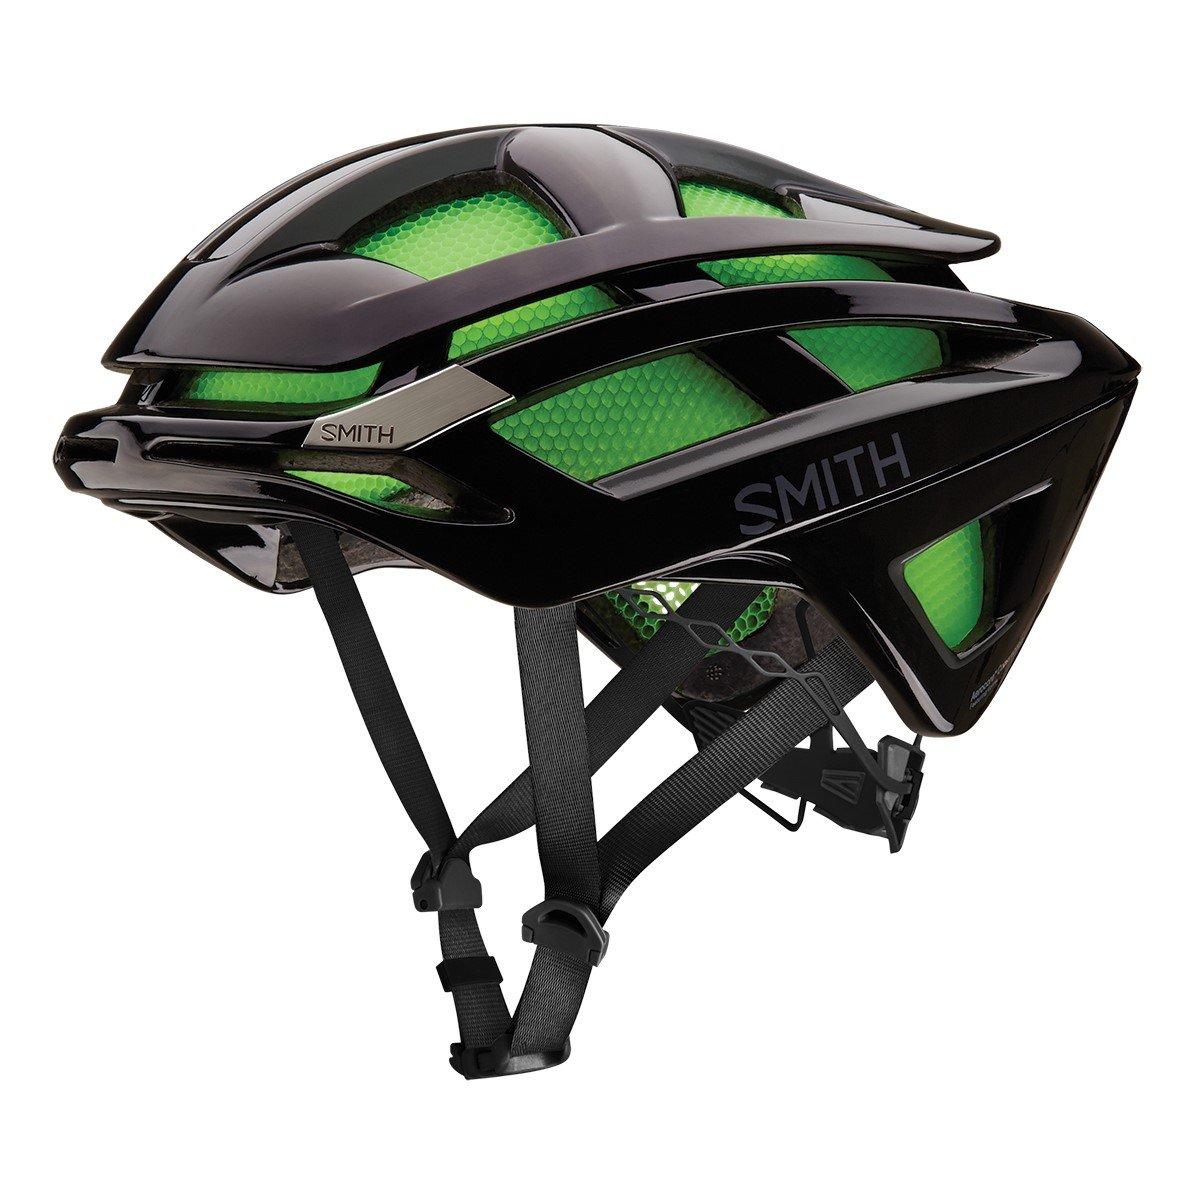 Smith Overtake MIPS Helmet Black, M